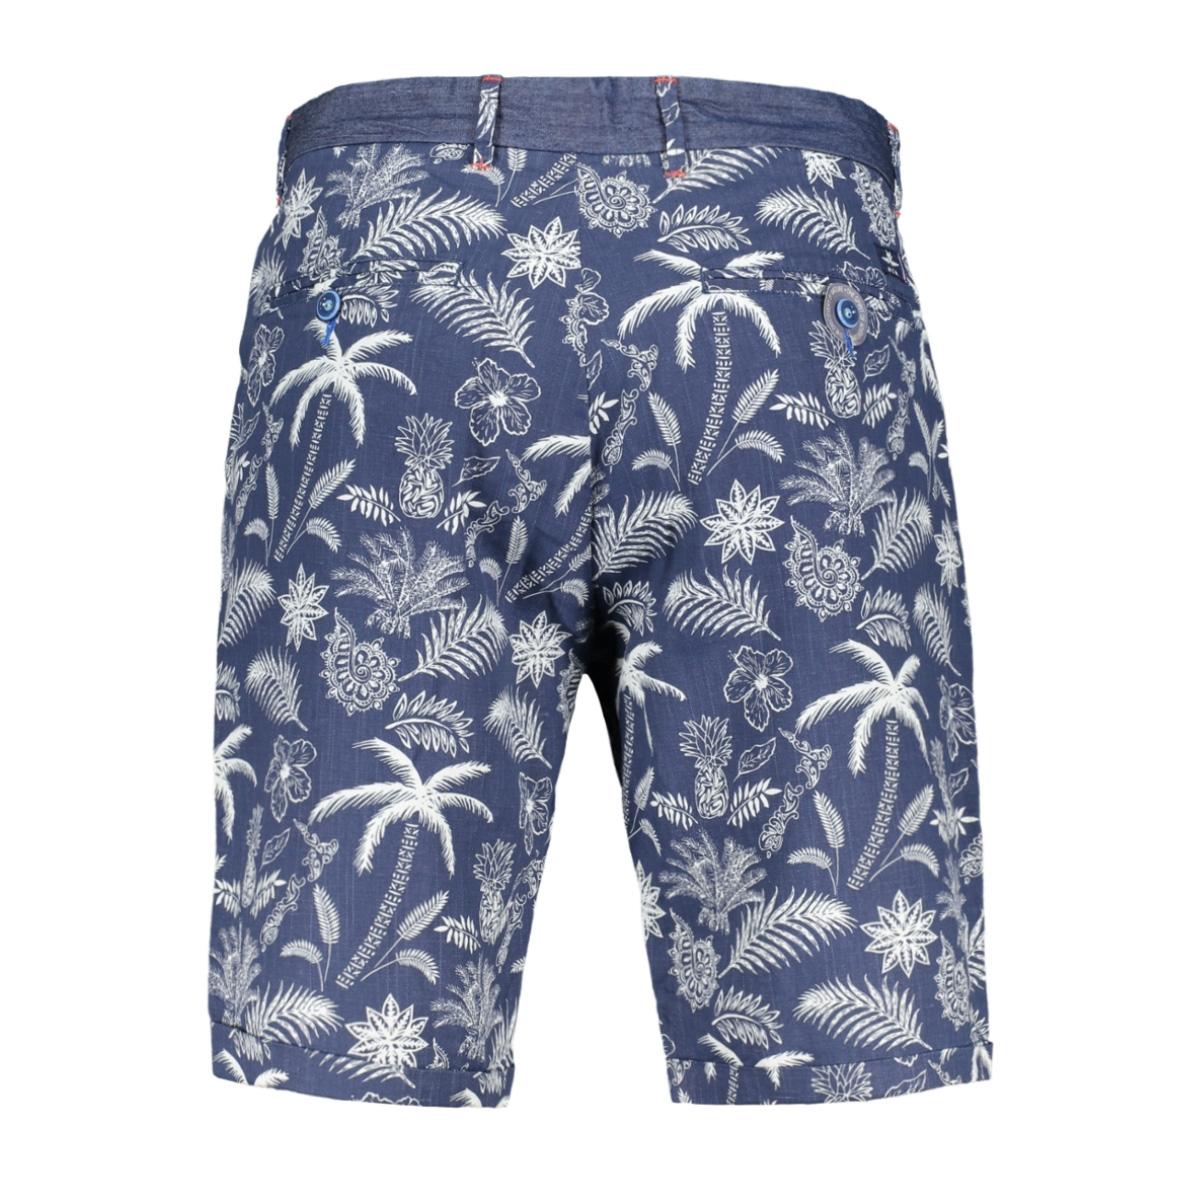 hot water beach 19cn628 nza korte broek 262 summer navy